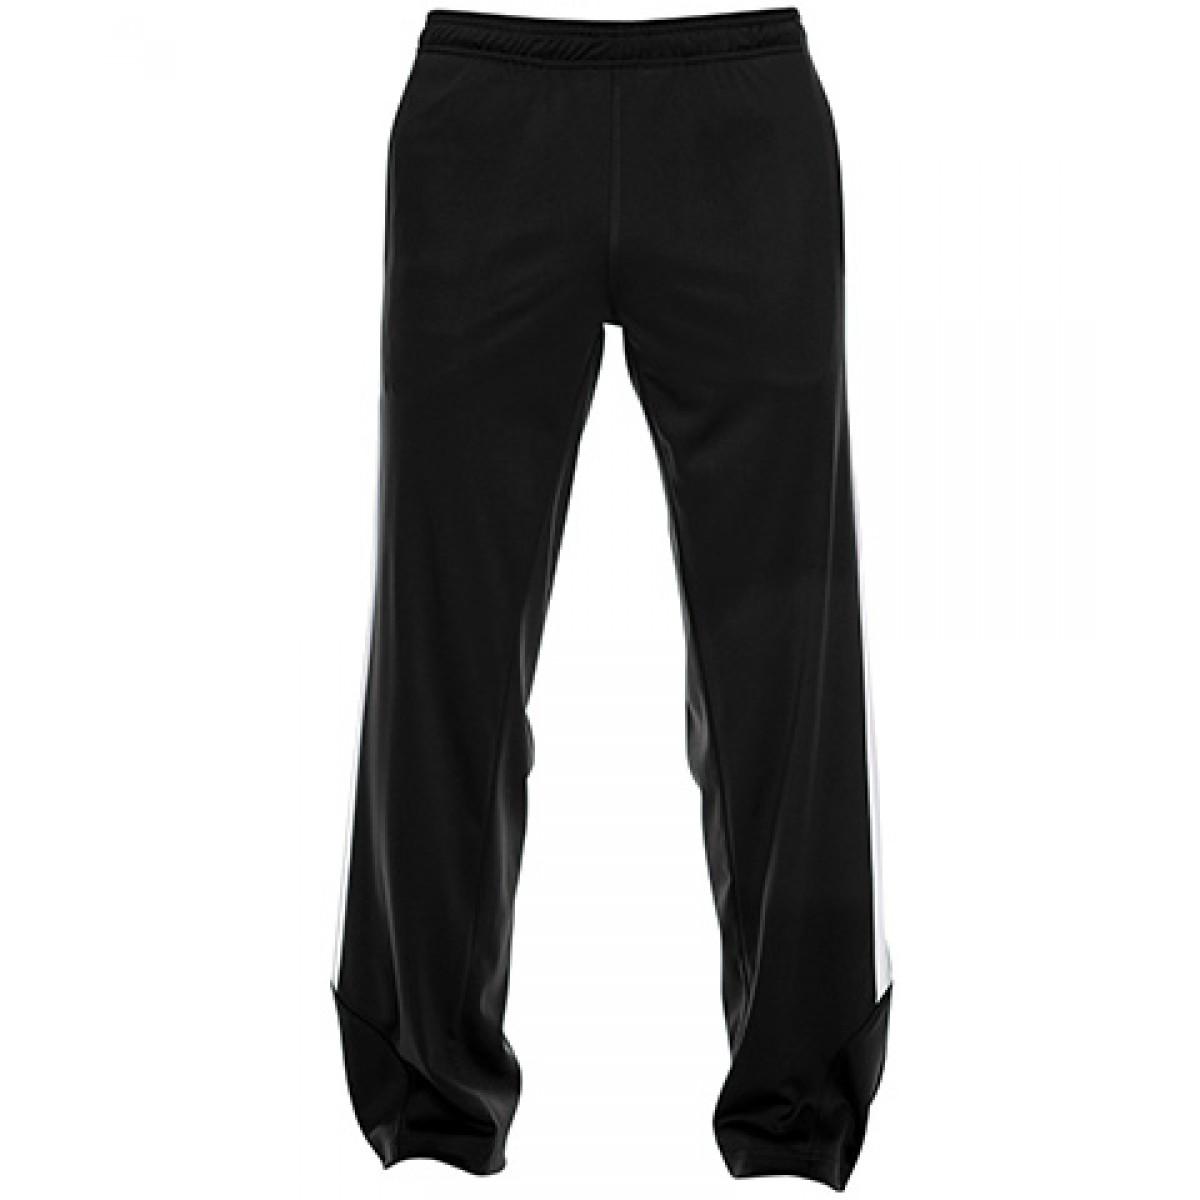 Men's Elite Performance Fleece Pant-Black-XS